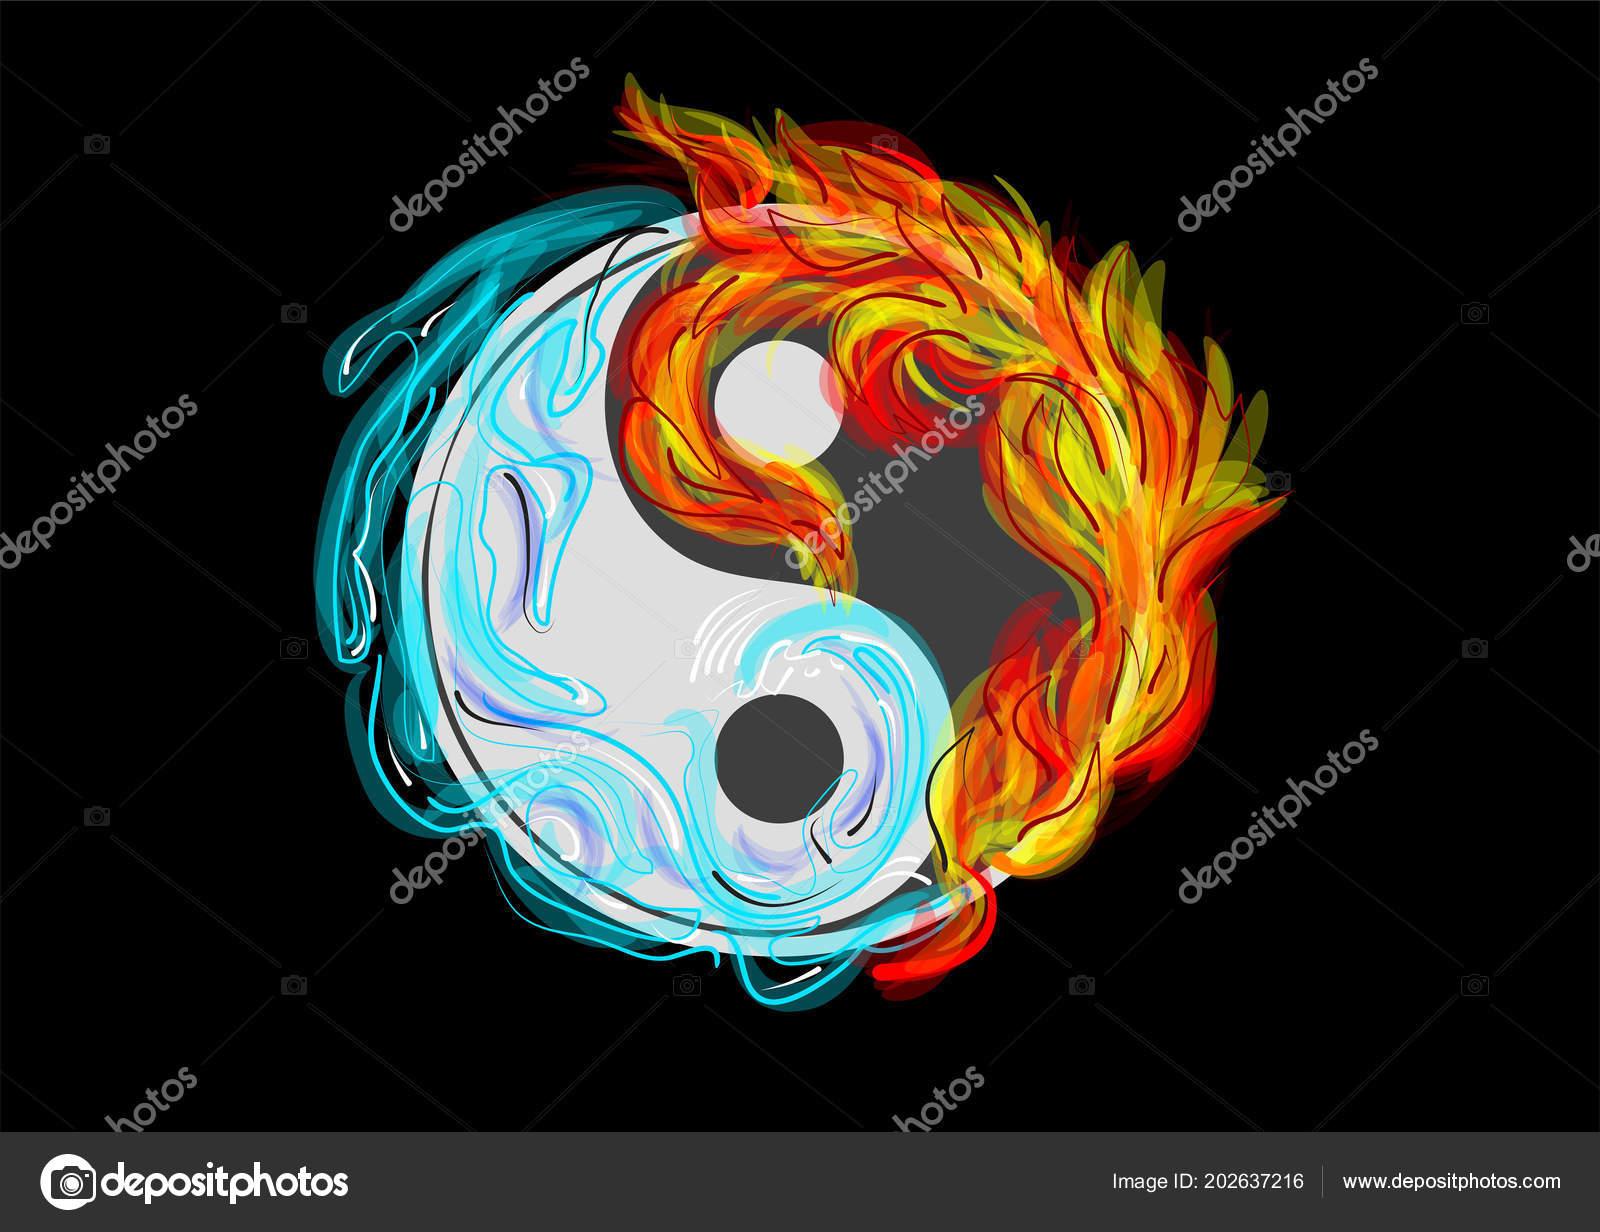 Yin Yang Symbol Water Fire Arkela 202637216